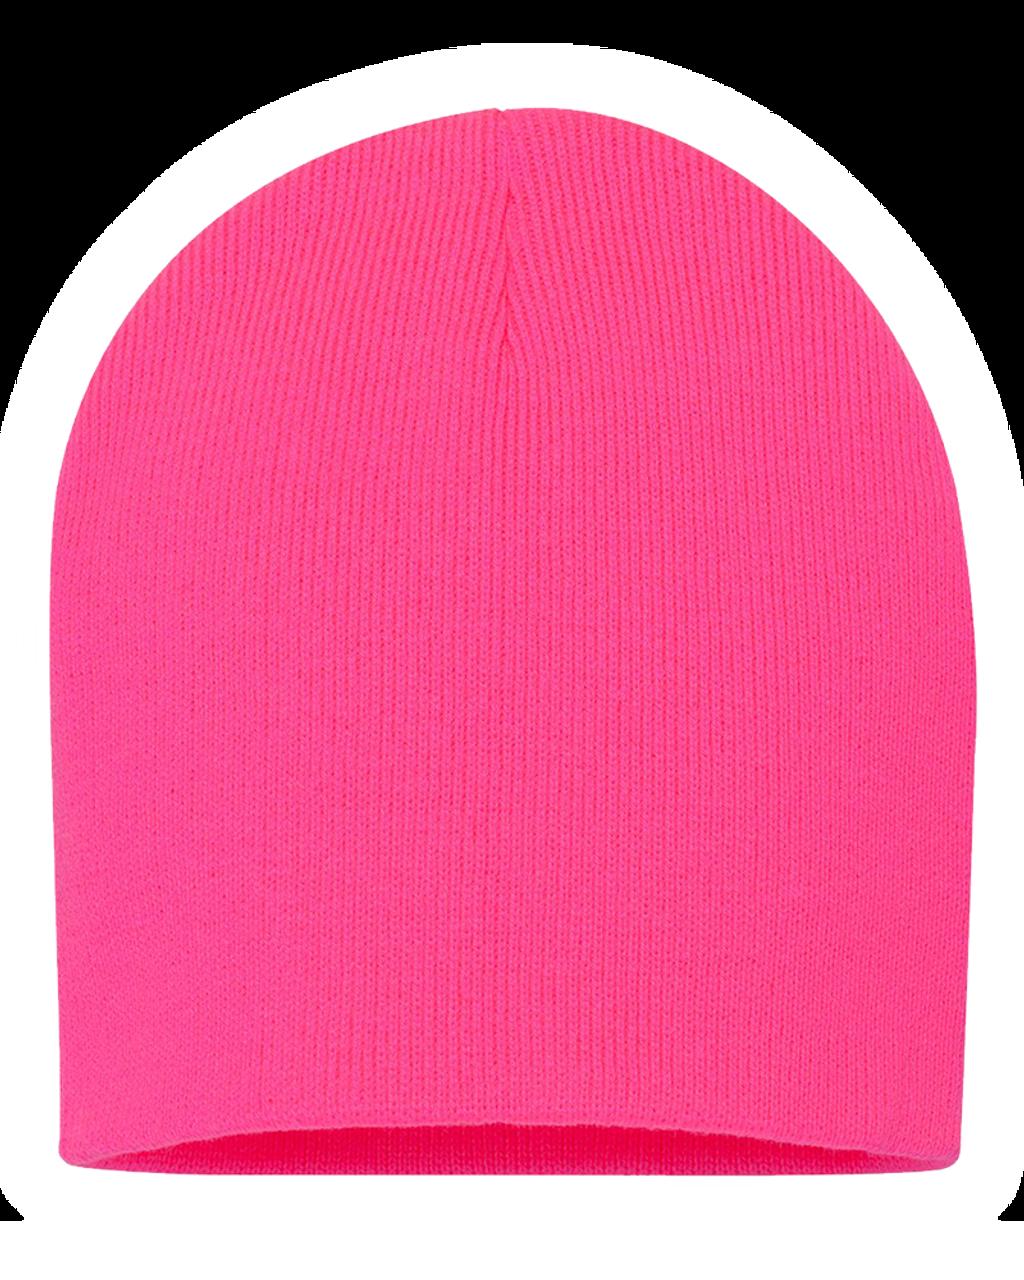 SP08 in Neon Pink